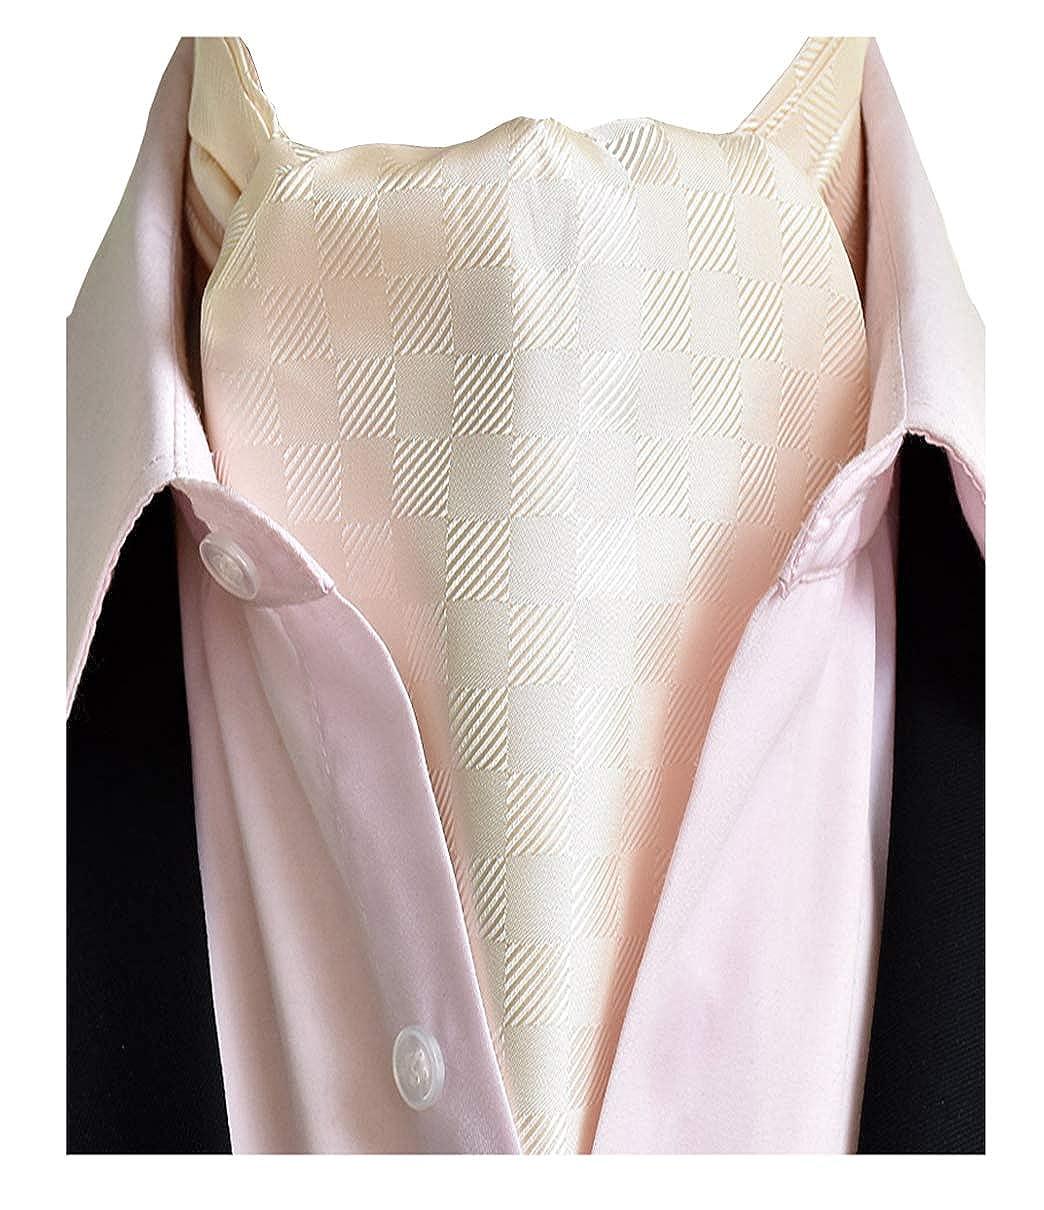 L04BABY Men's Champagne Check Plaid Cravat Ties 100% Silk Woven Scarf Ascot Tie LINGJINA201911